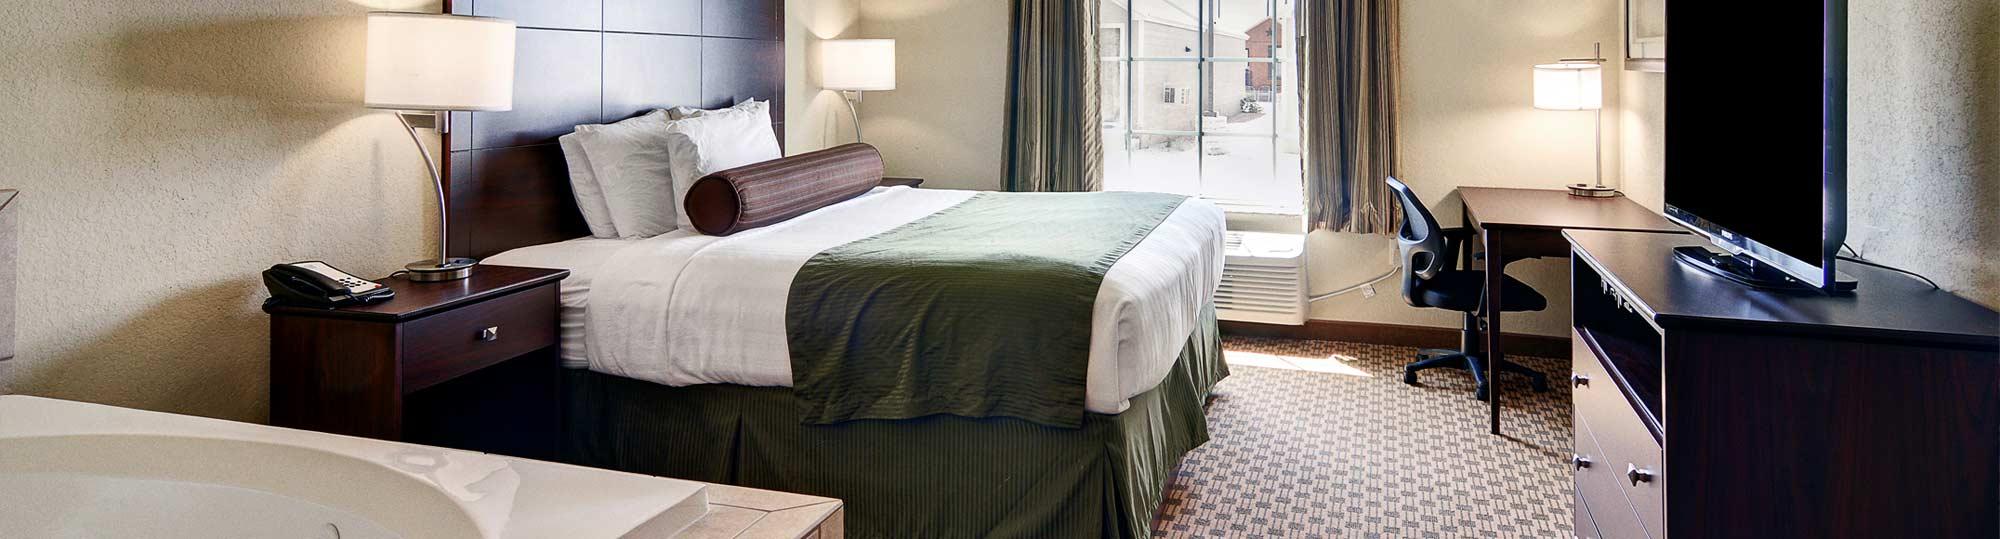 Cobblestone Inn & Suites Big Lake